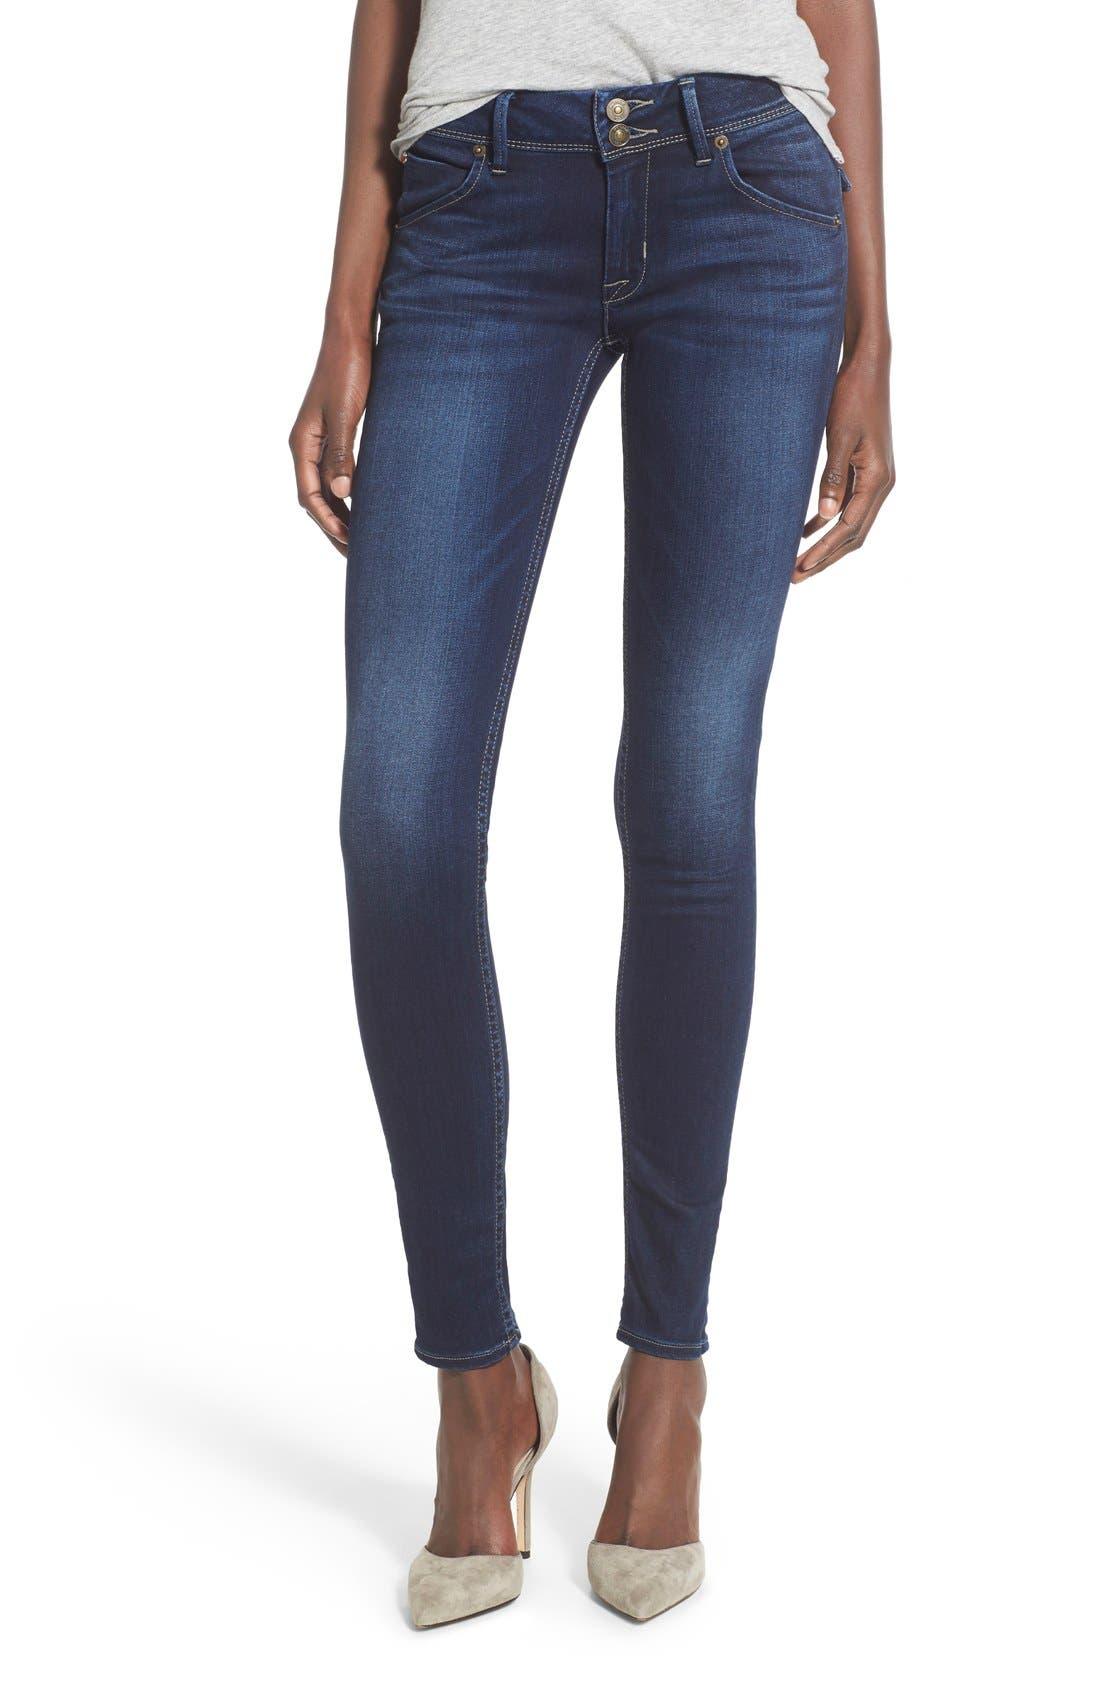 Main Image - Hudson Jeans 'Elysian - Collin' Mid Rise Skinny Jeans (Crest Falls)